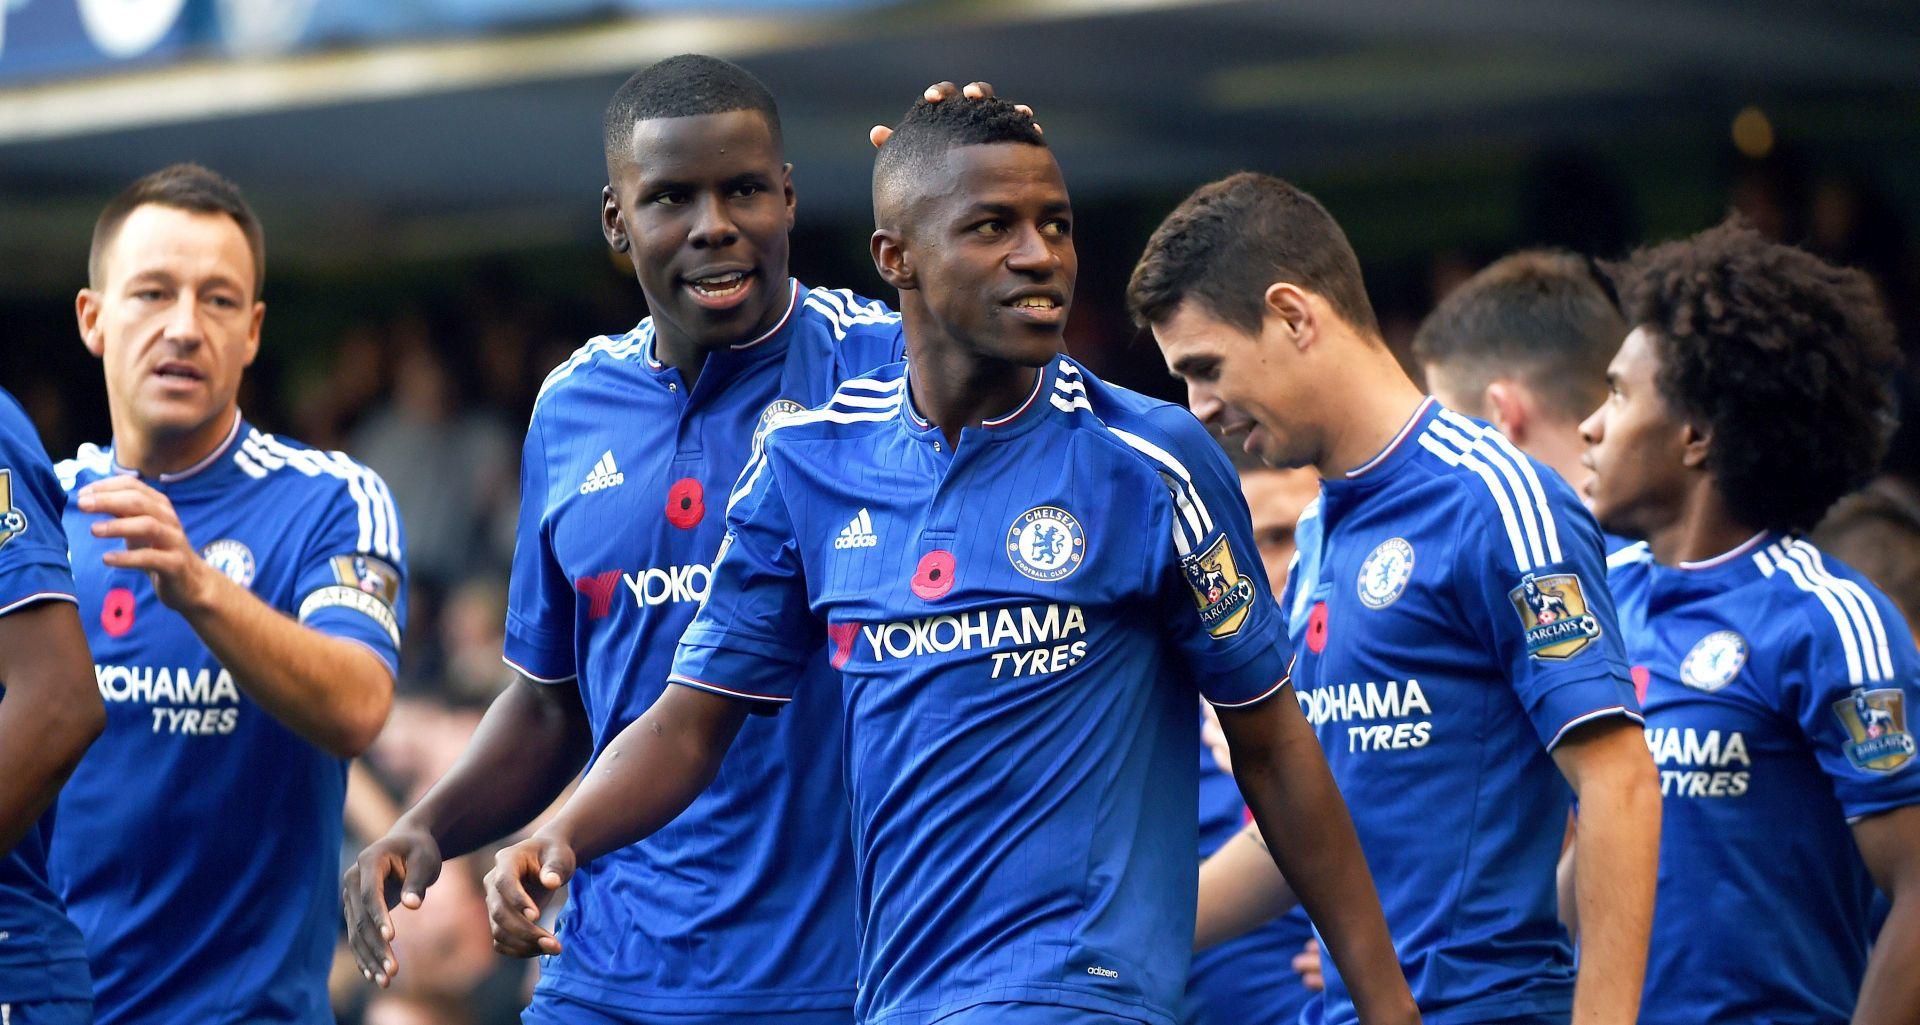 Chelsea prošle sezone ostvario gubitak od 23.1 milijun funti